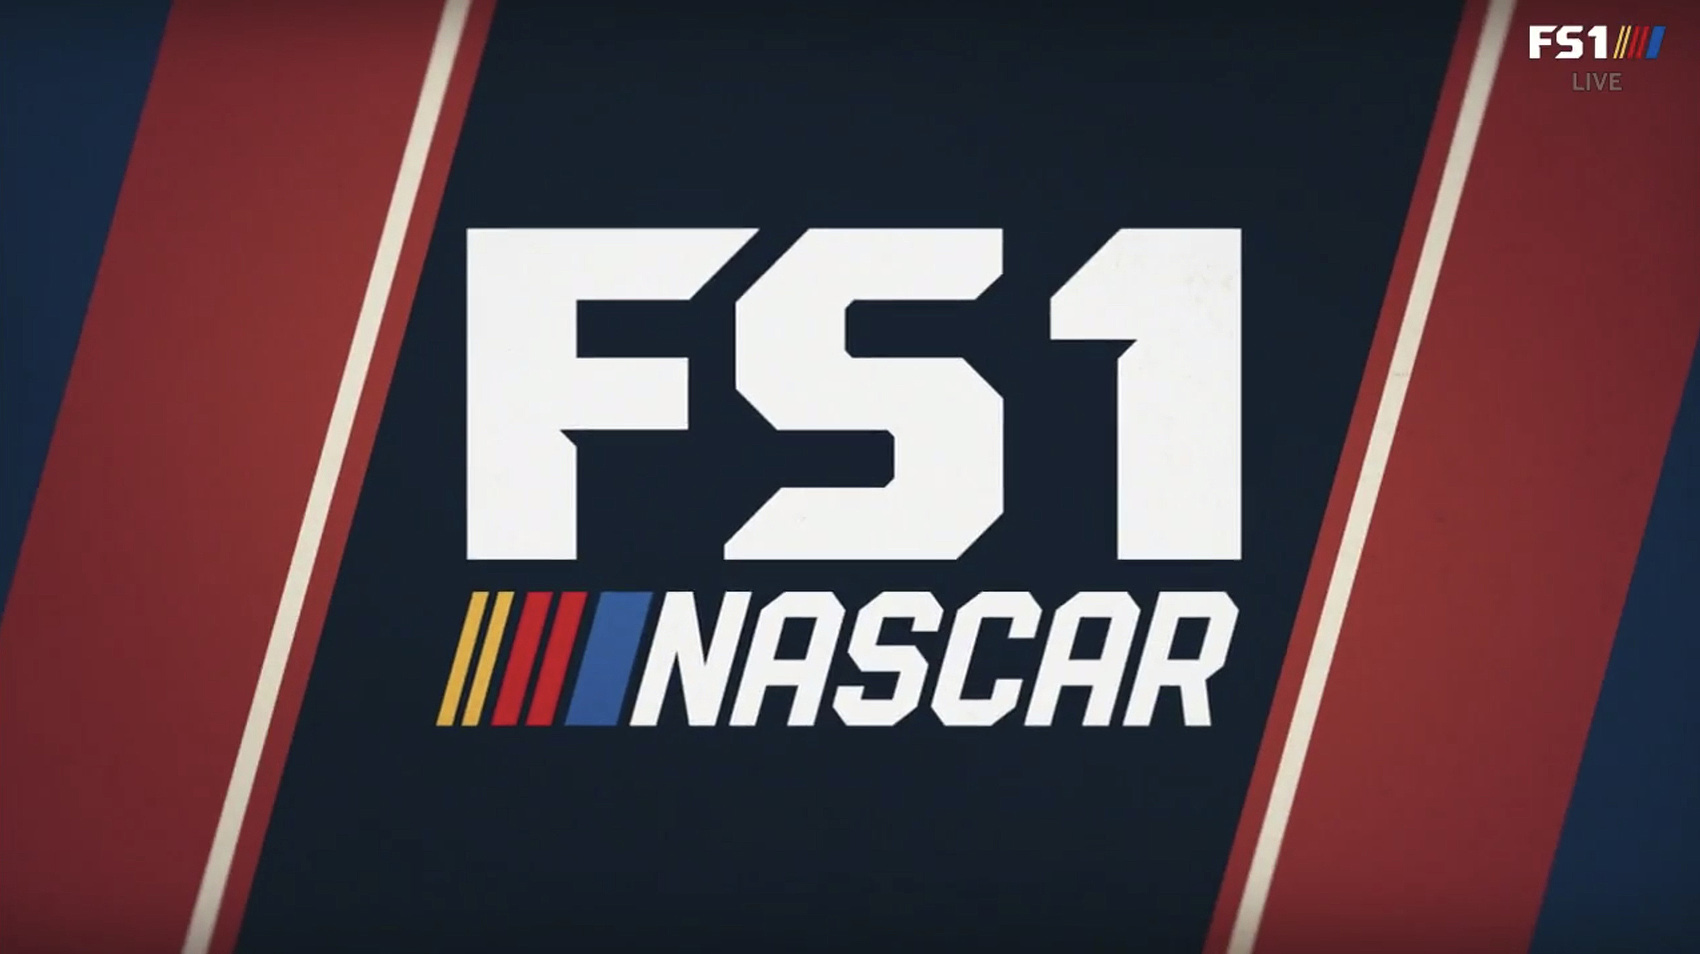 NCS_NASCAR-Fox-2019-Broadcast-Design_034